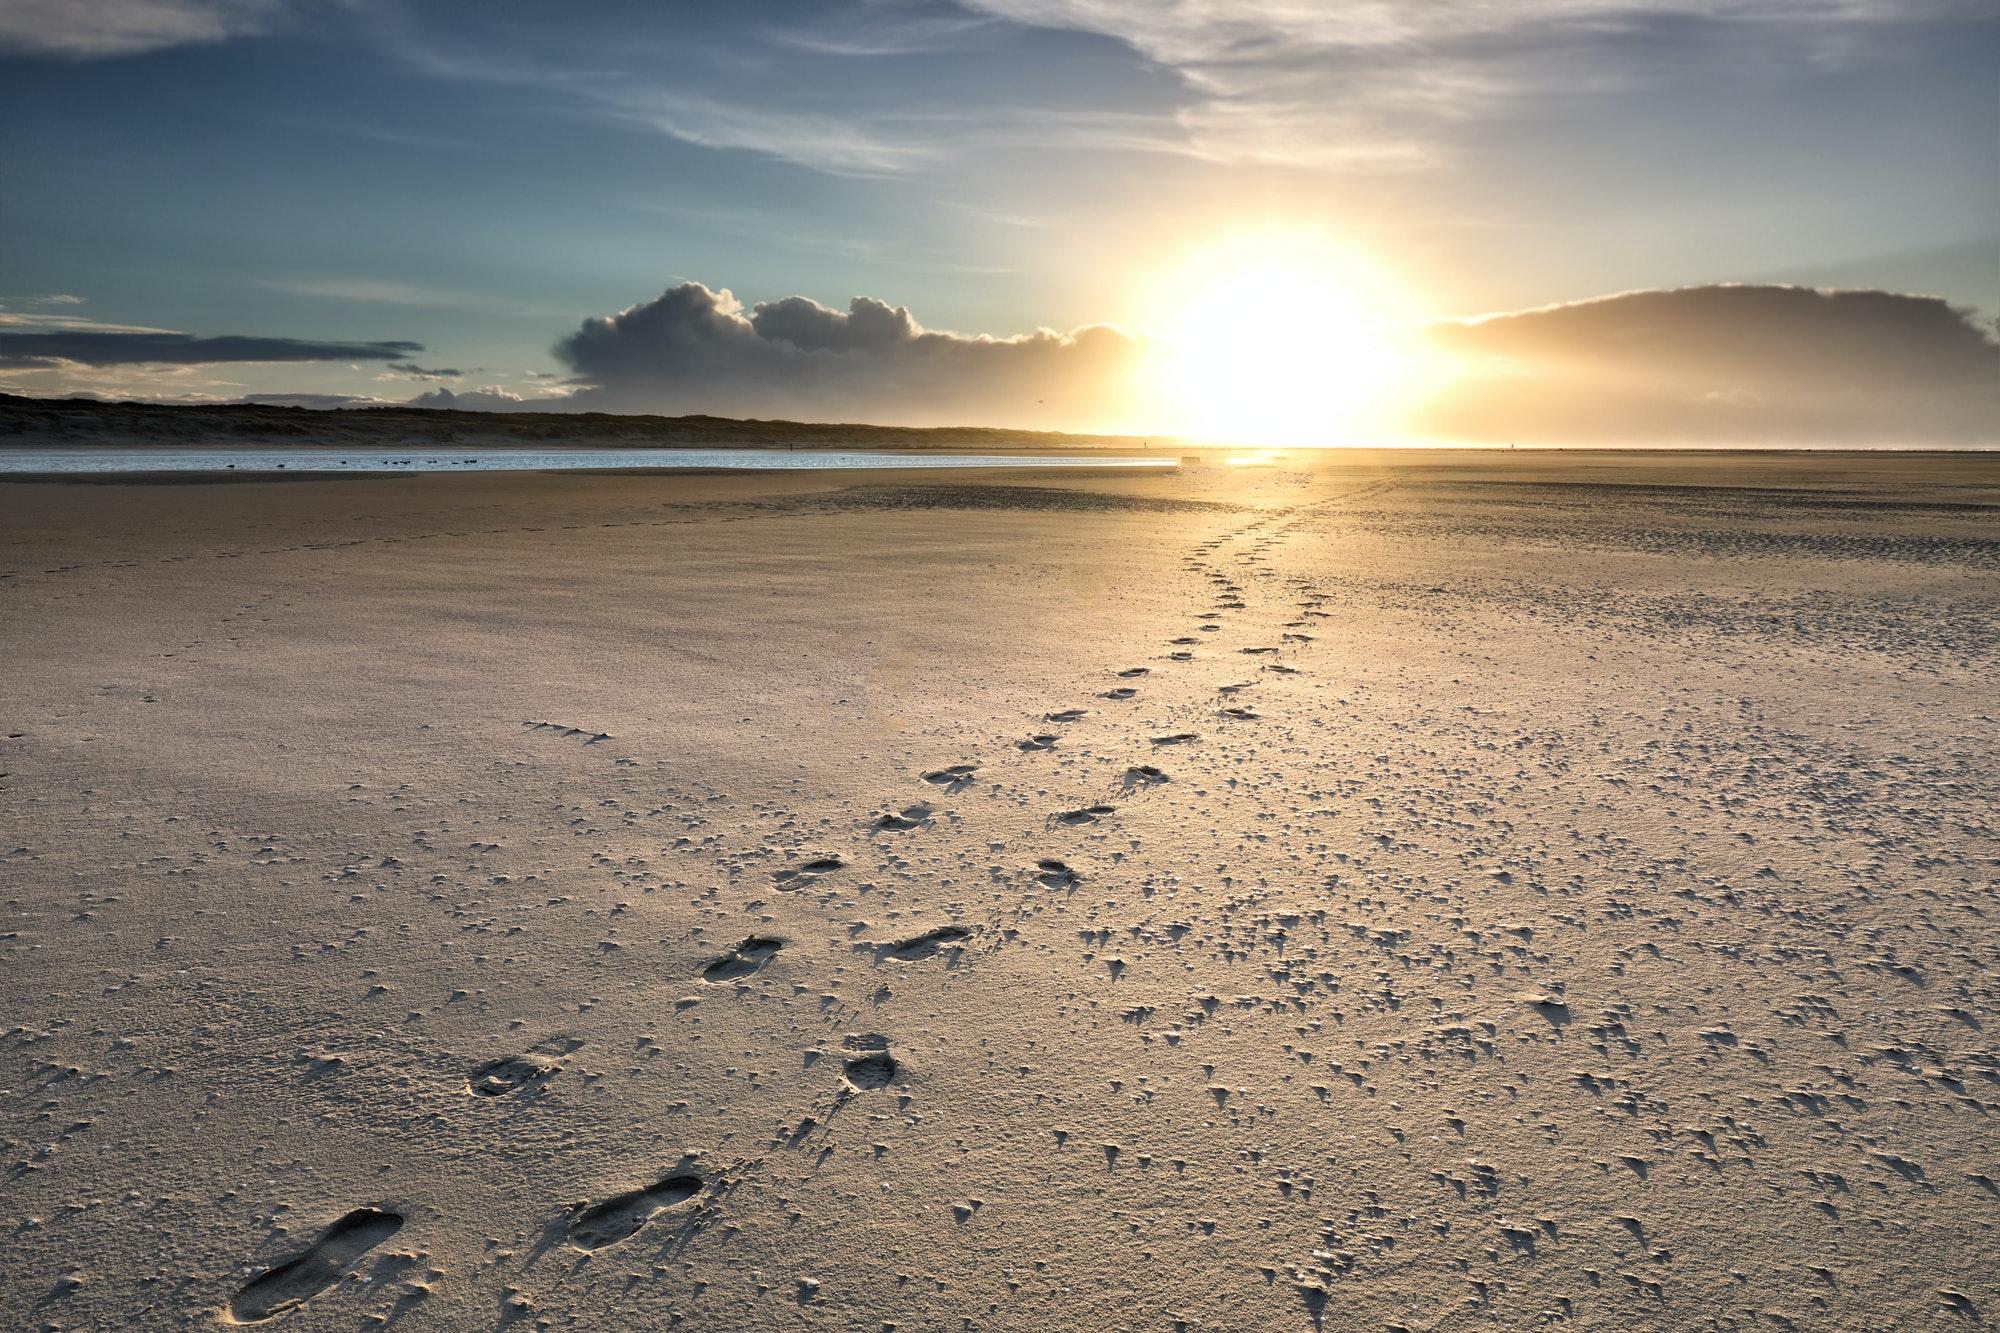 track path on sand beach to sun